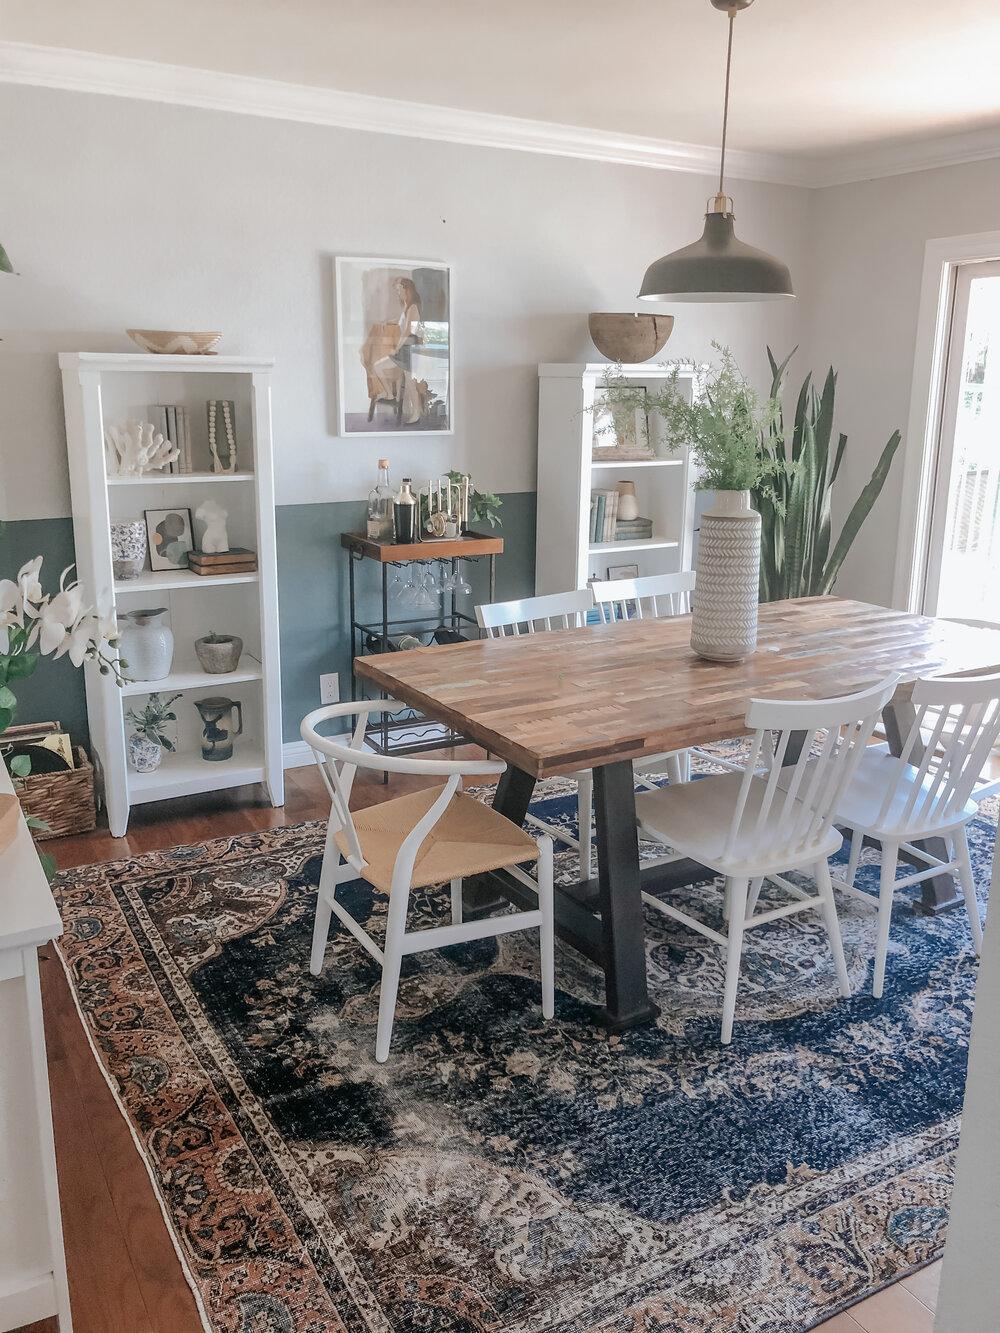 Choosing The Right Rug Size Burnett, Dining Room Rug Size